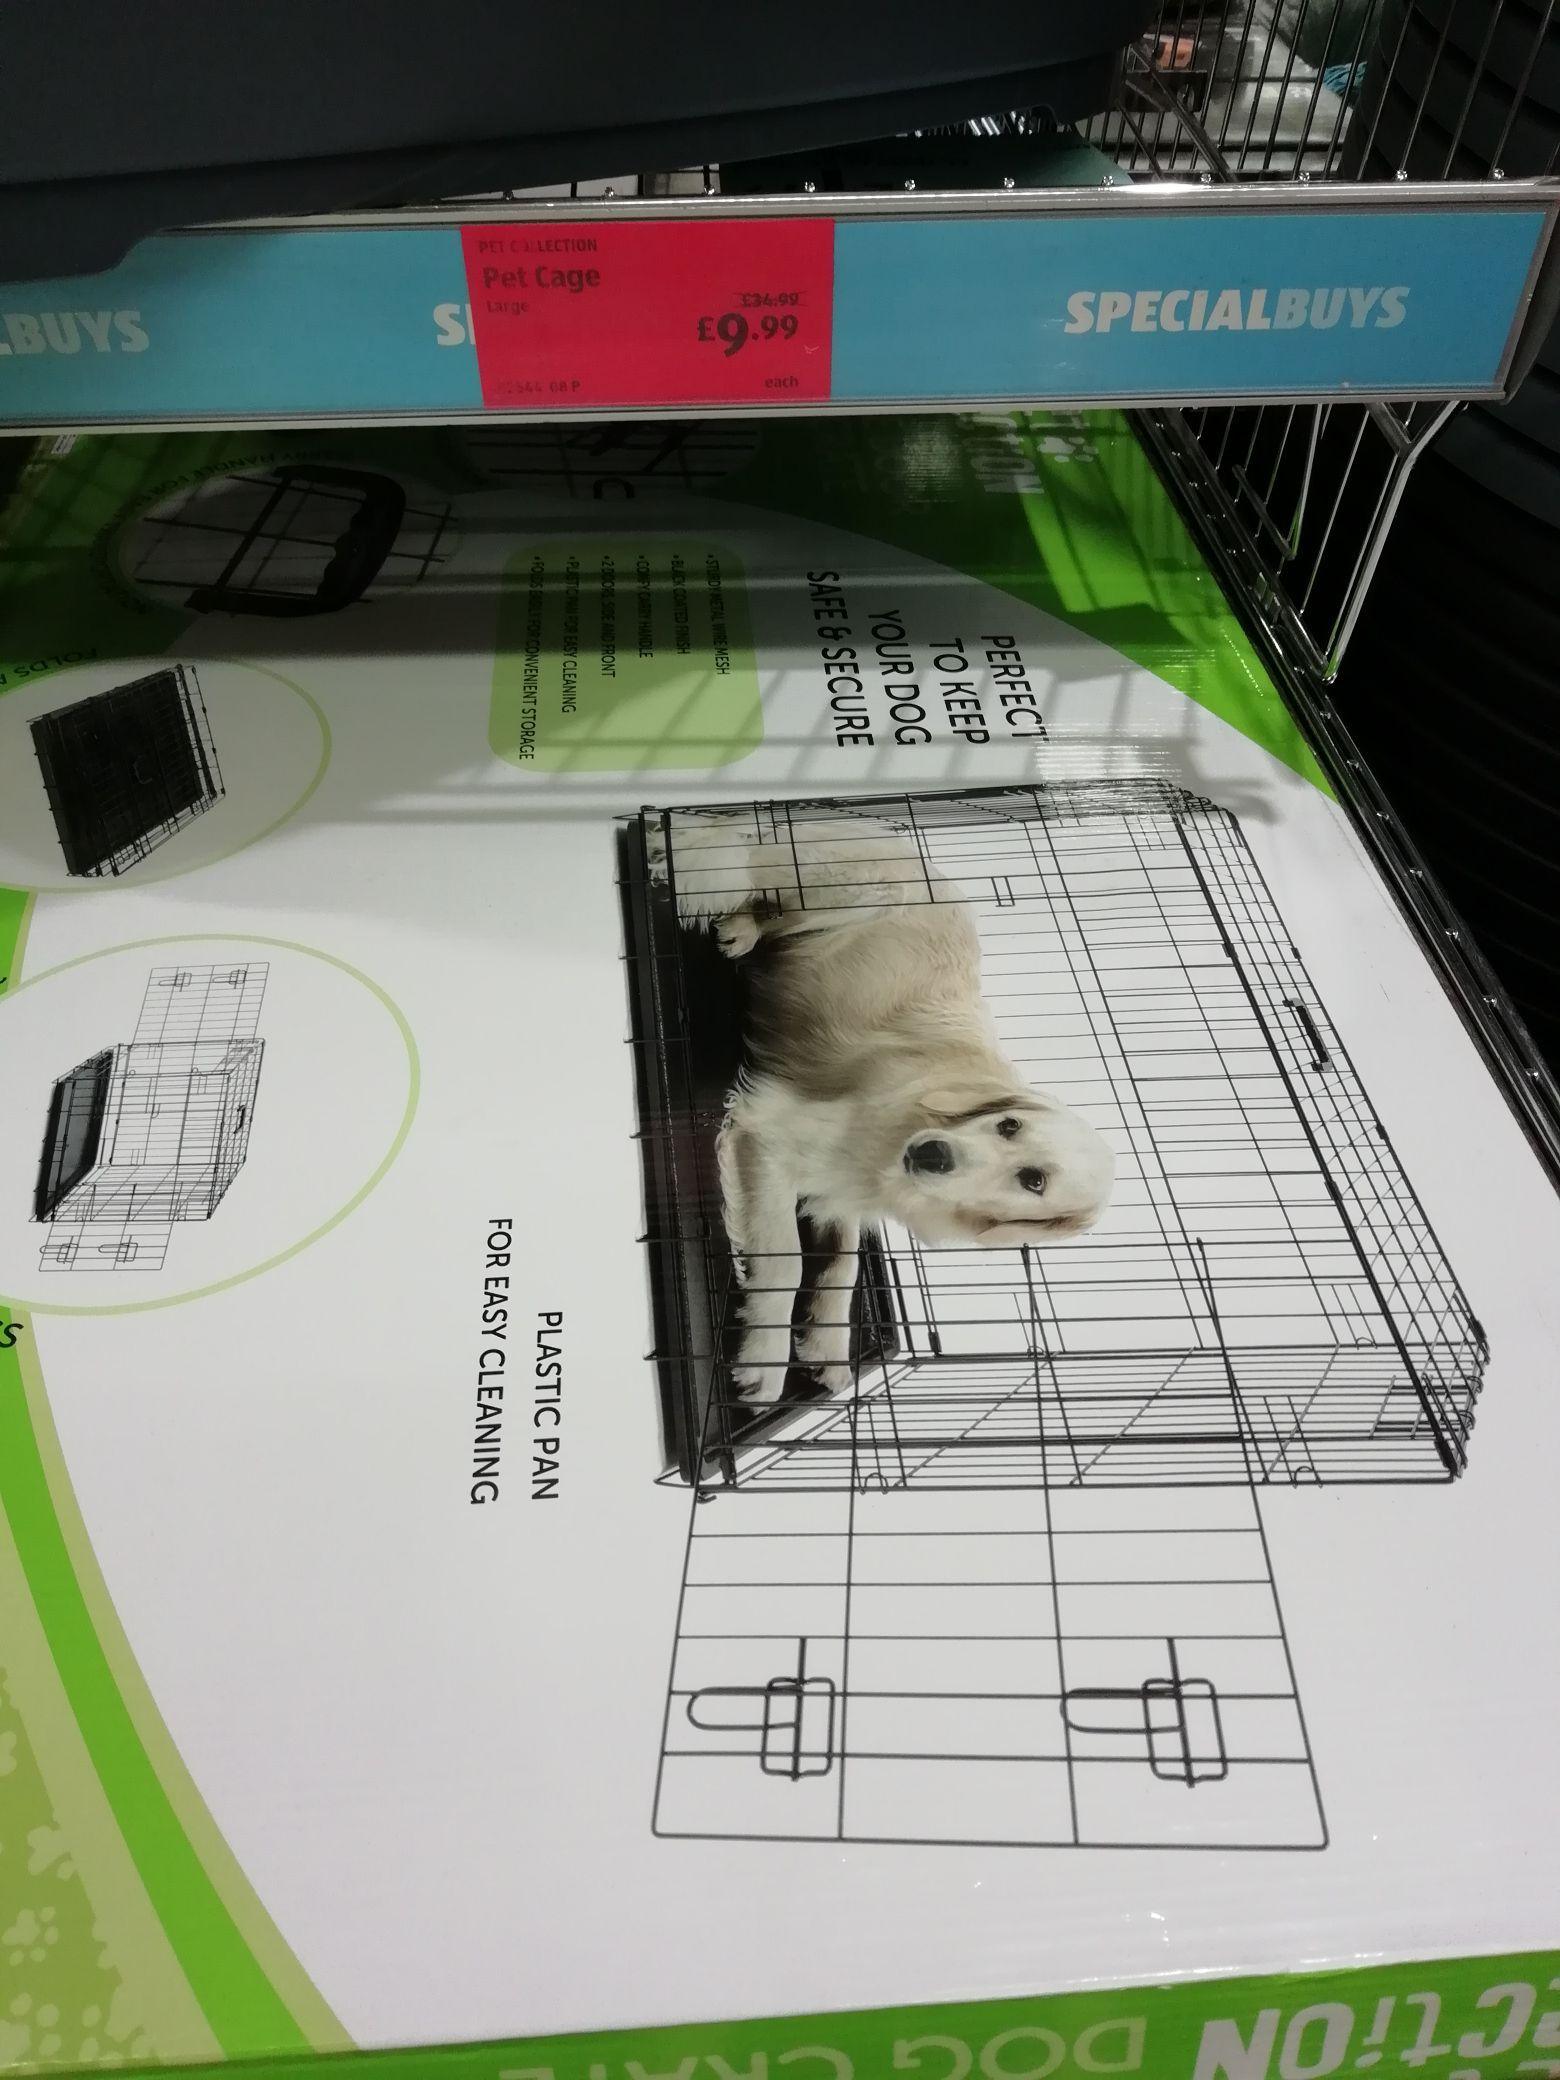 Aldi large pet crate / cage £9.99